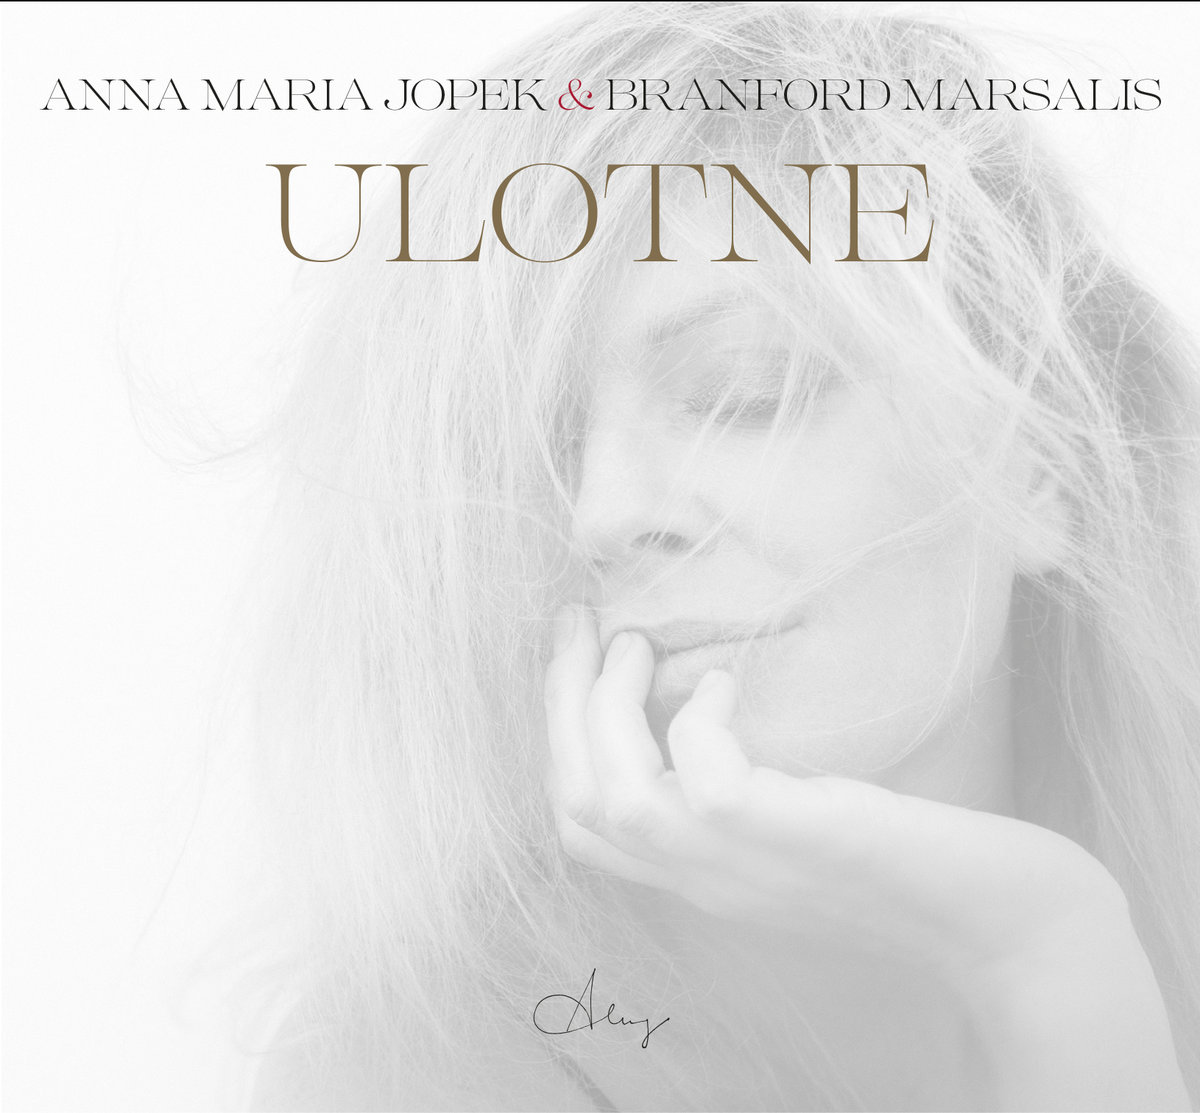 Anna Maria Jopek & Branford Marsalis ulotne-edycja-specjalna-b-iext53247847